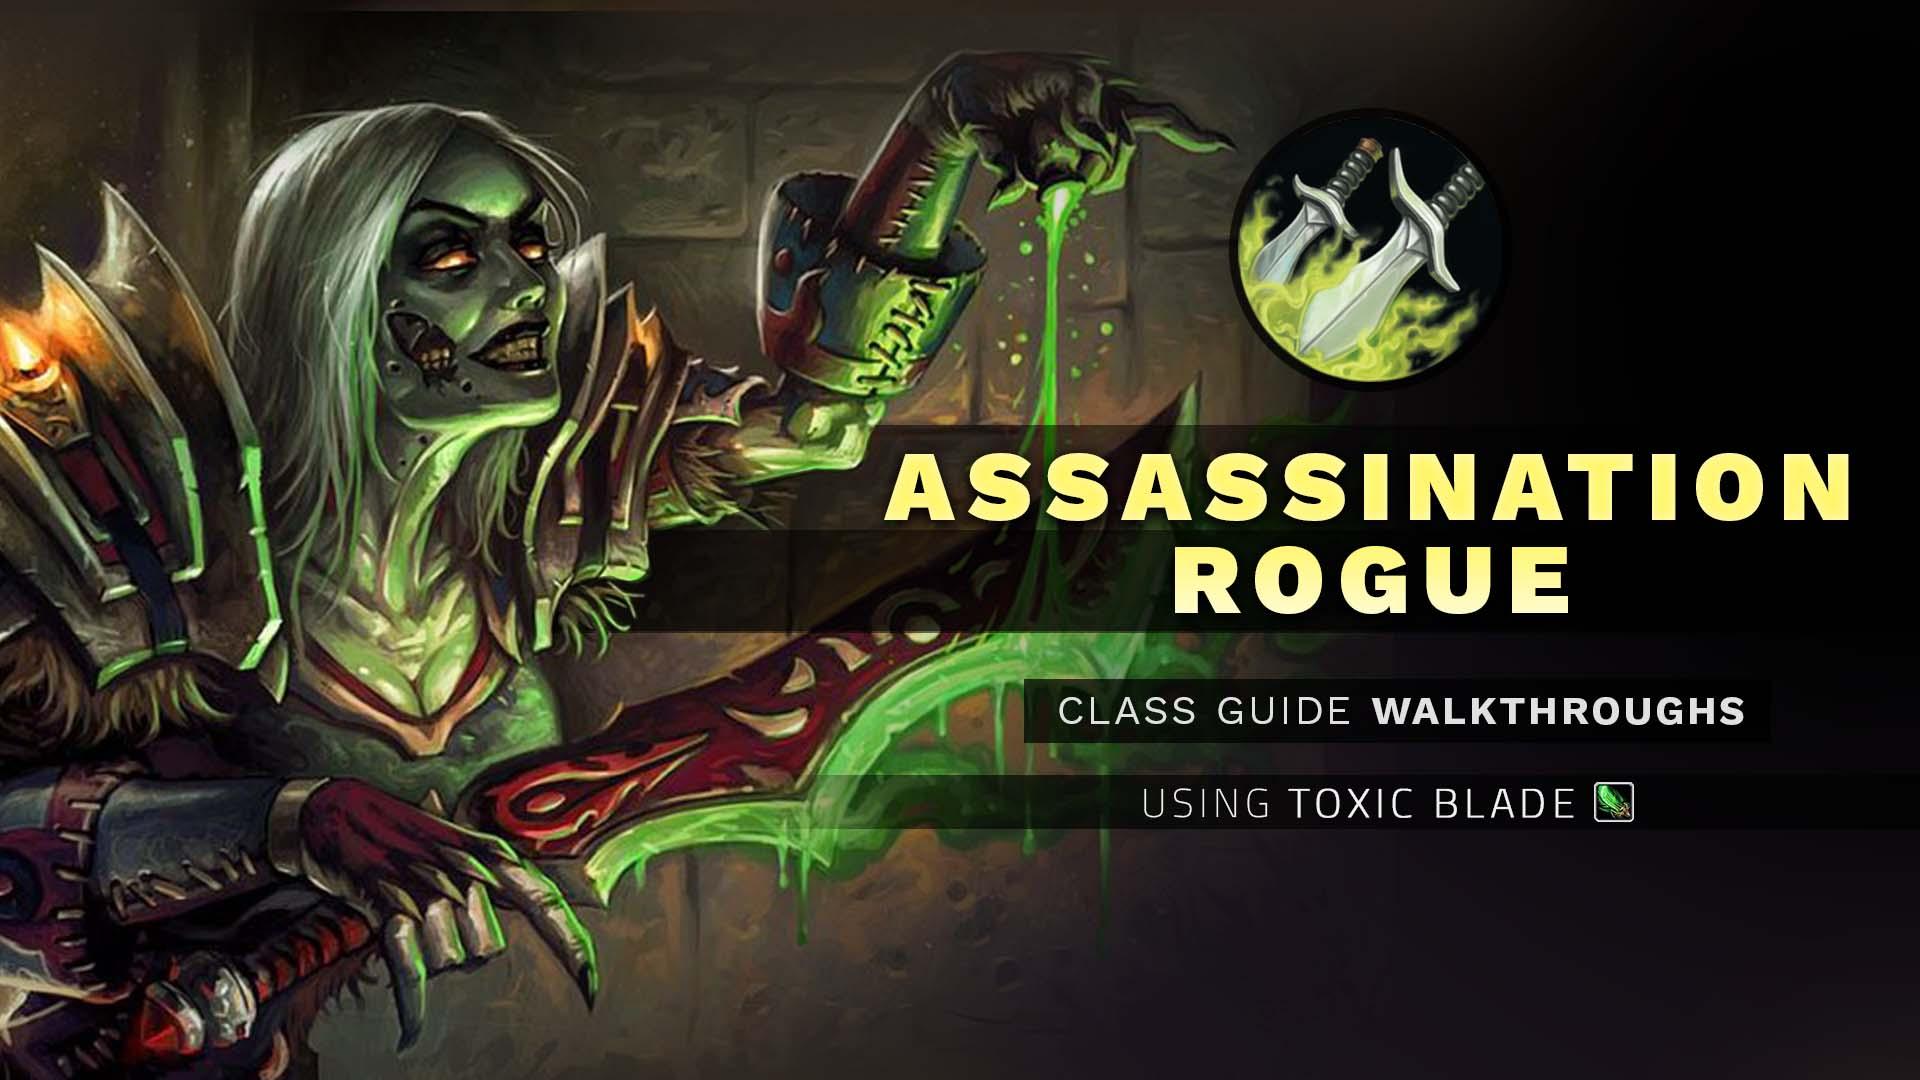 Rogue hunting log rank 1 - Assassination Rogue Cgw Using Toxic Blade Wow Pvp Guide